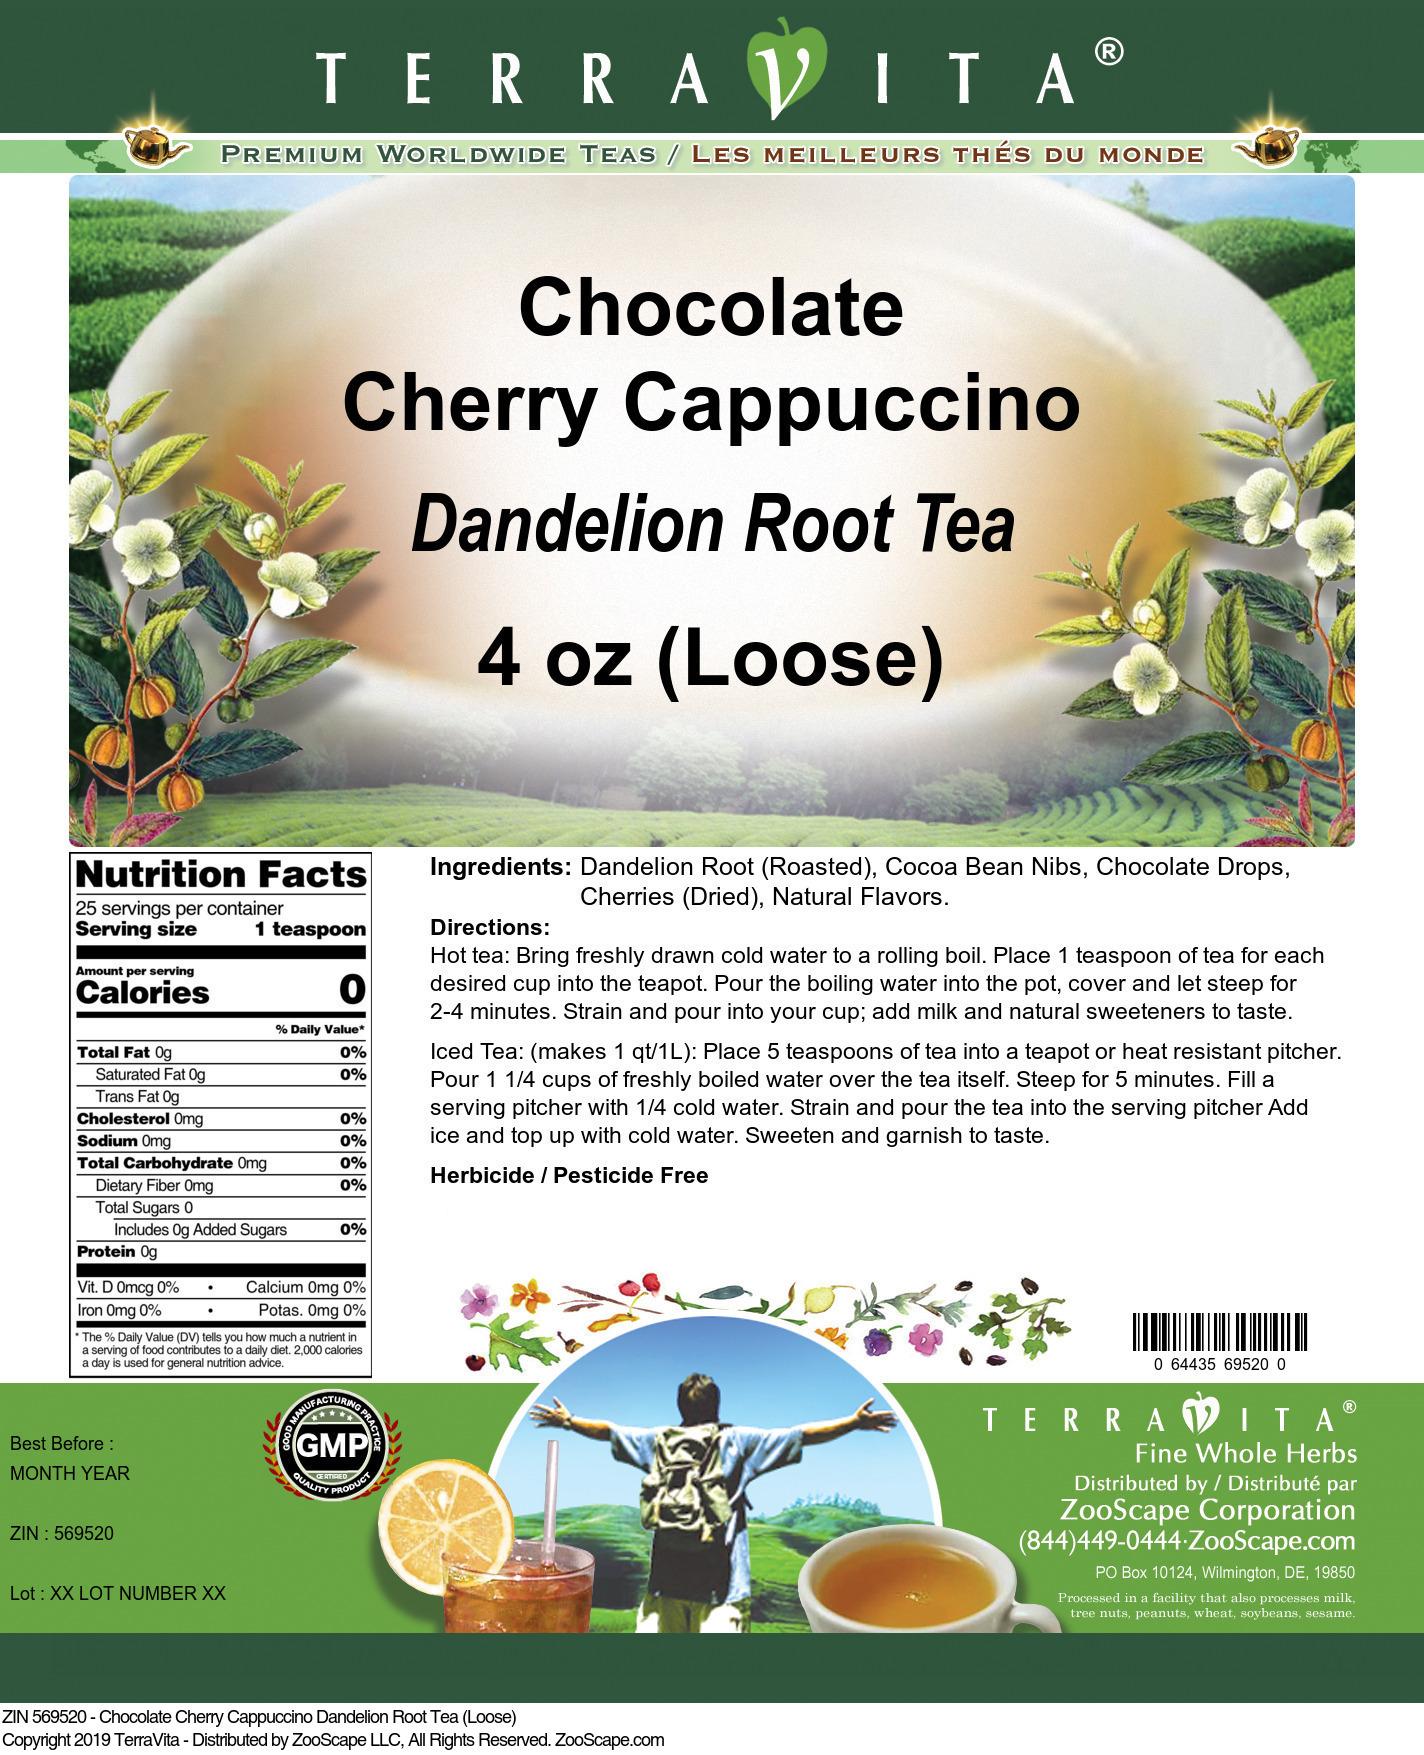 Chocolate Cherry Cappuccino Dandelion Root